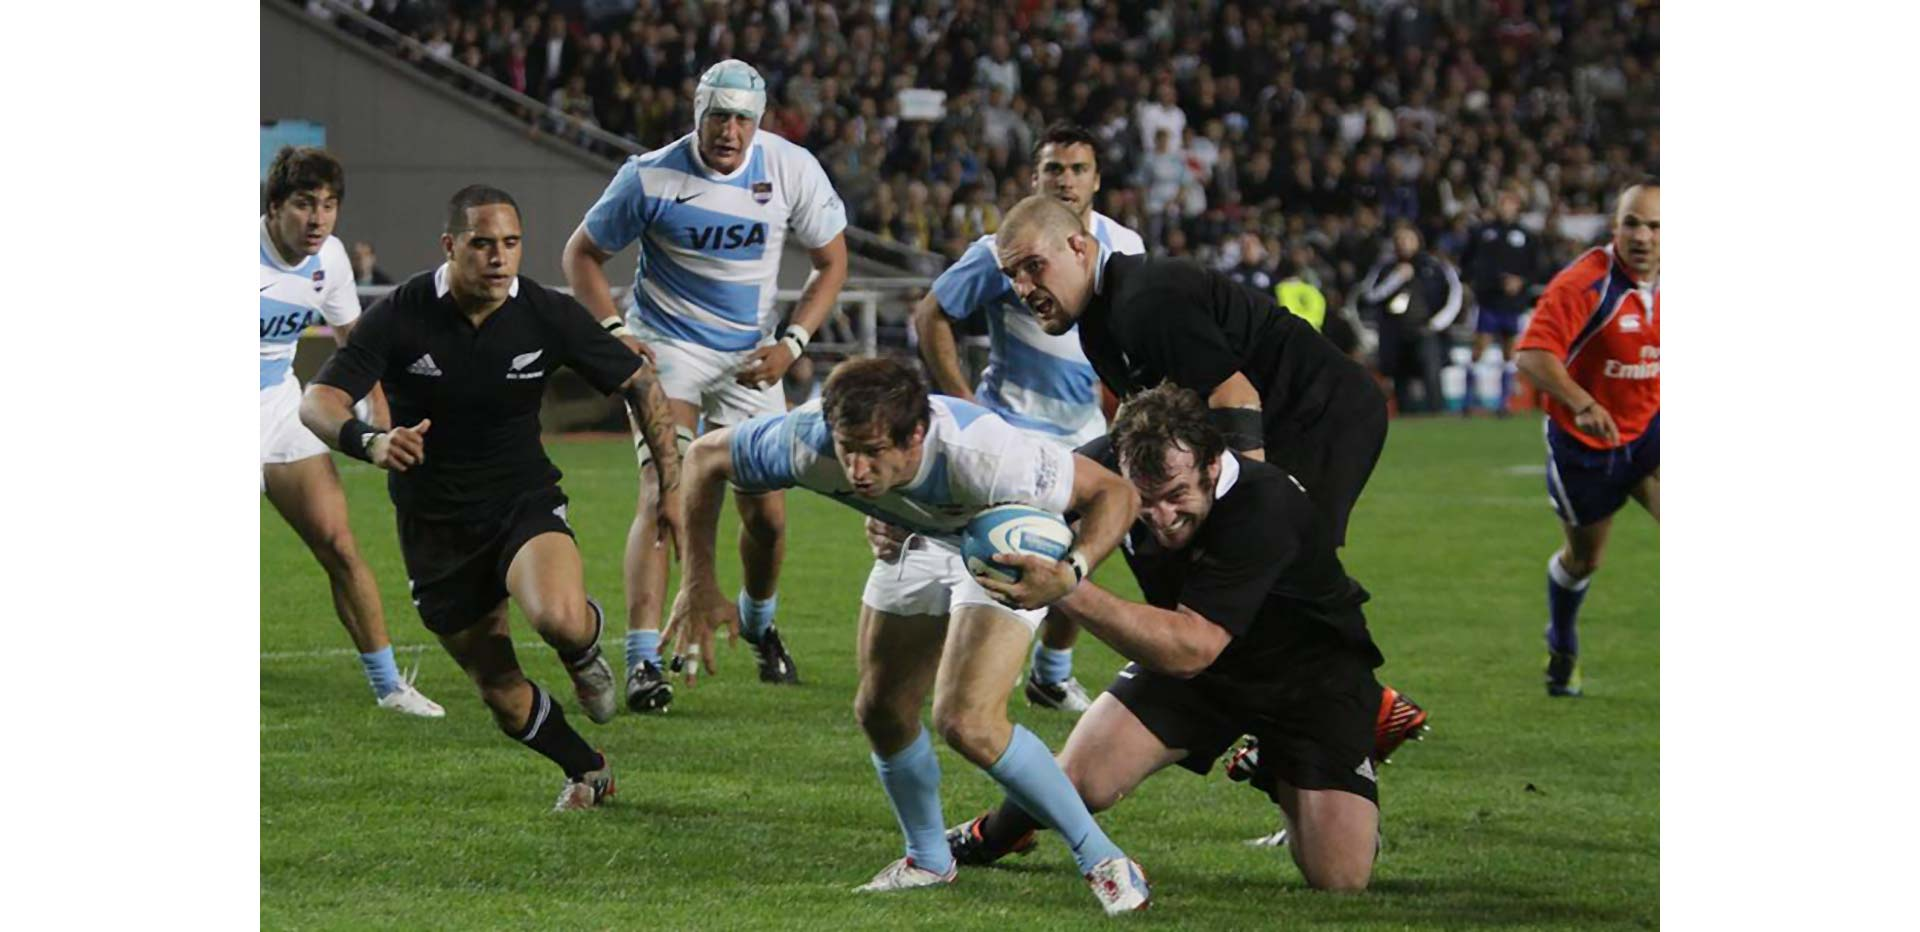 Adelanto_rugby_3_caja